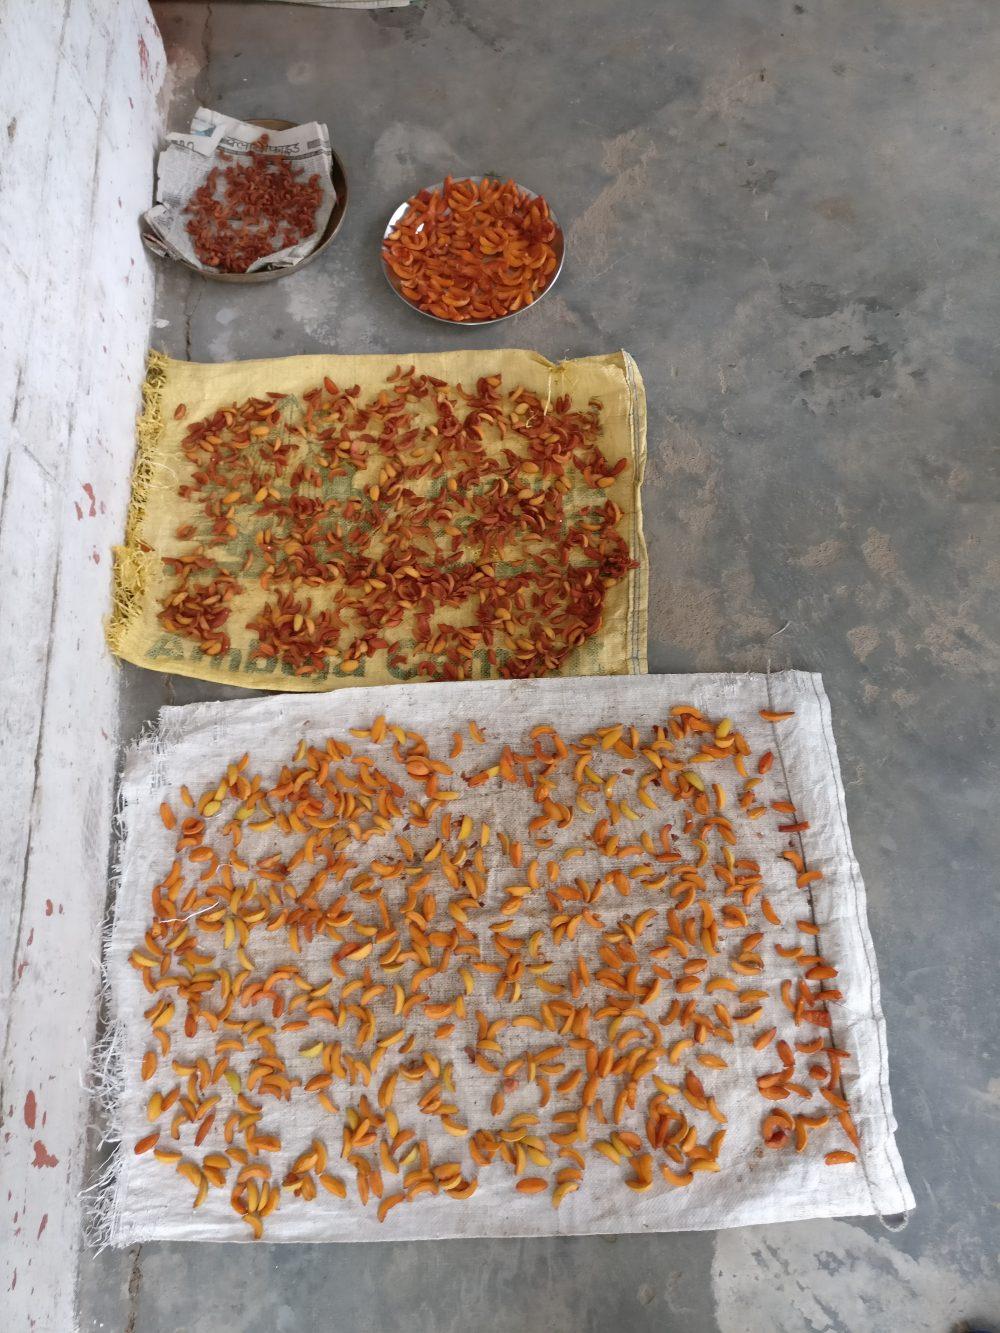 Grandma's House And Her Apricot Orchard Mukteshwar 3